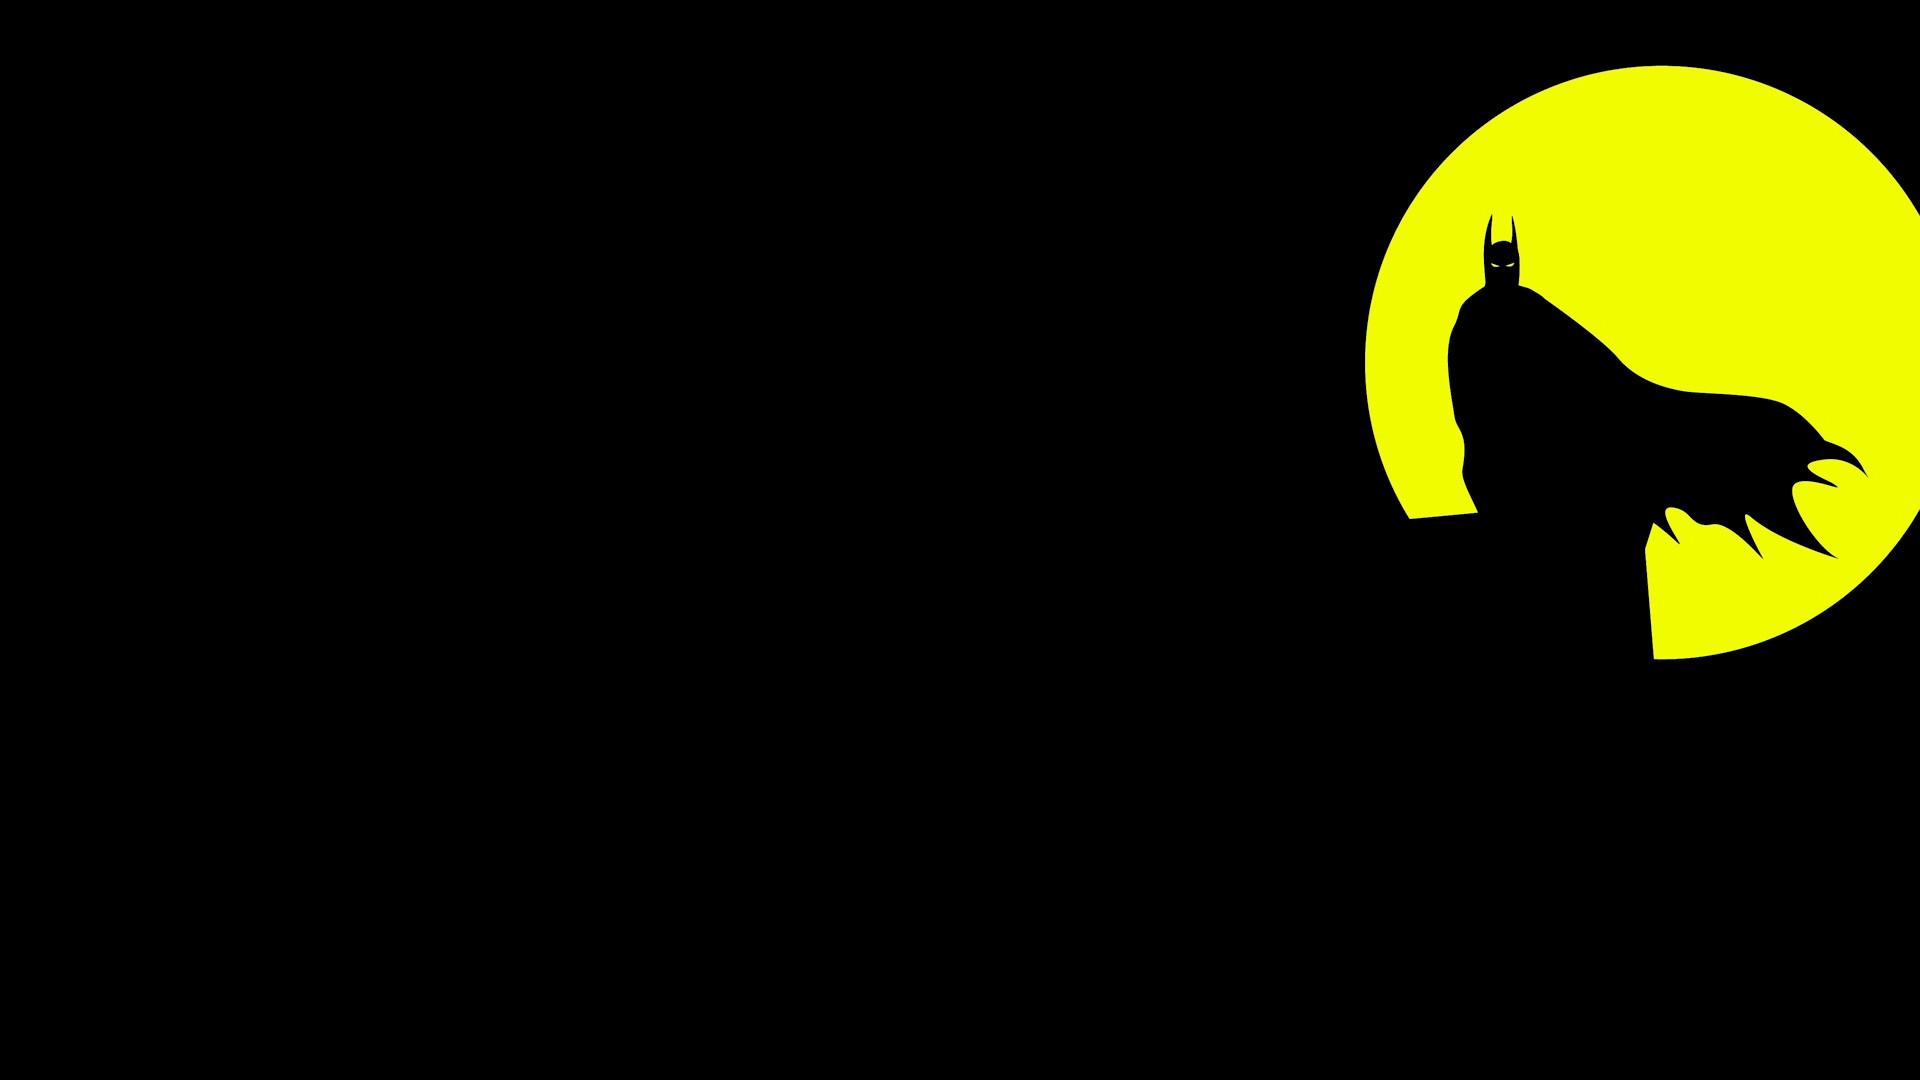 batman hd wallpaper for iphone 74 images